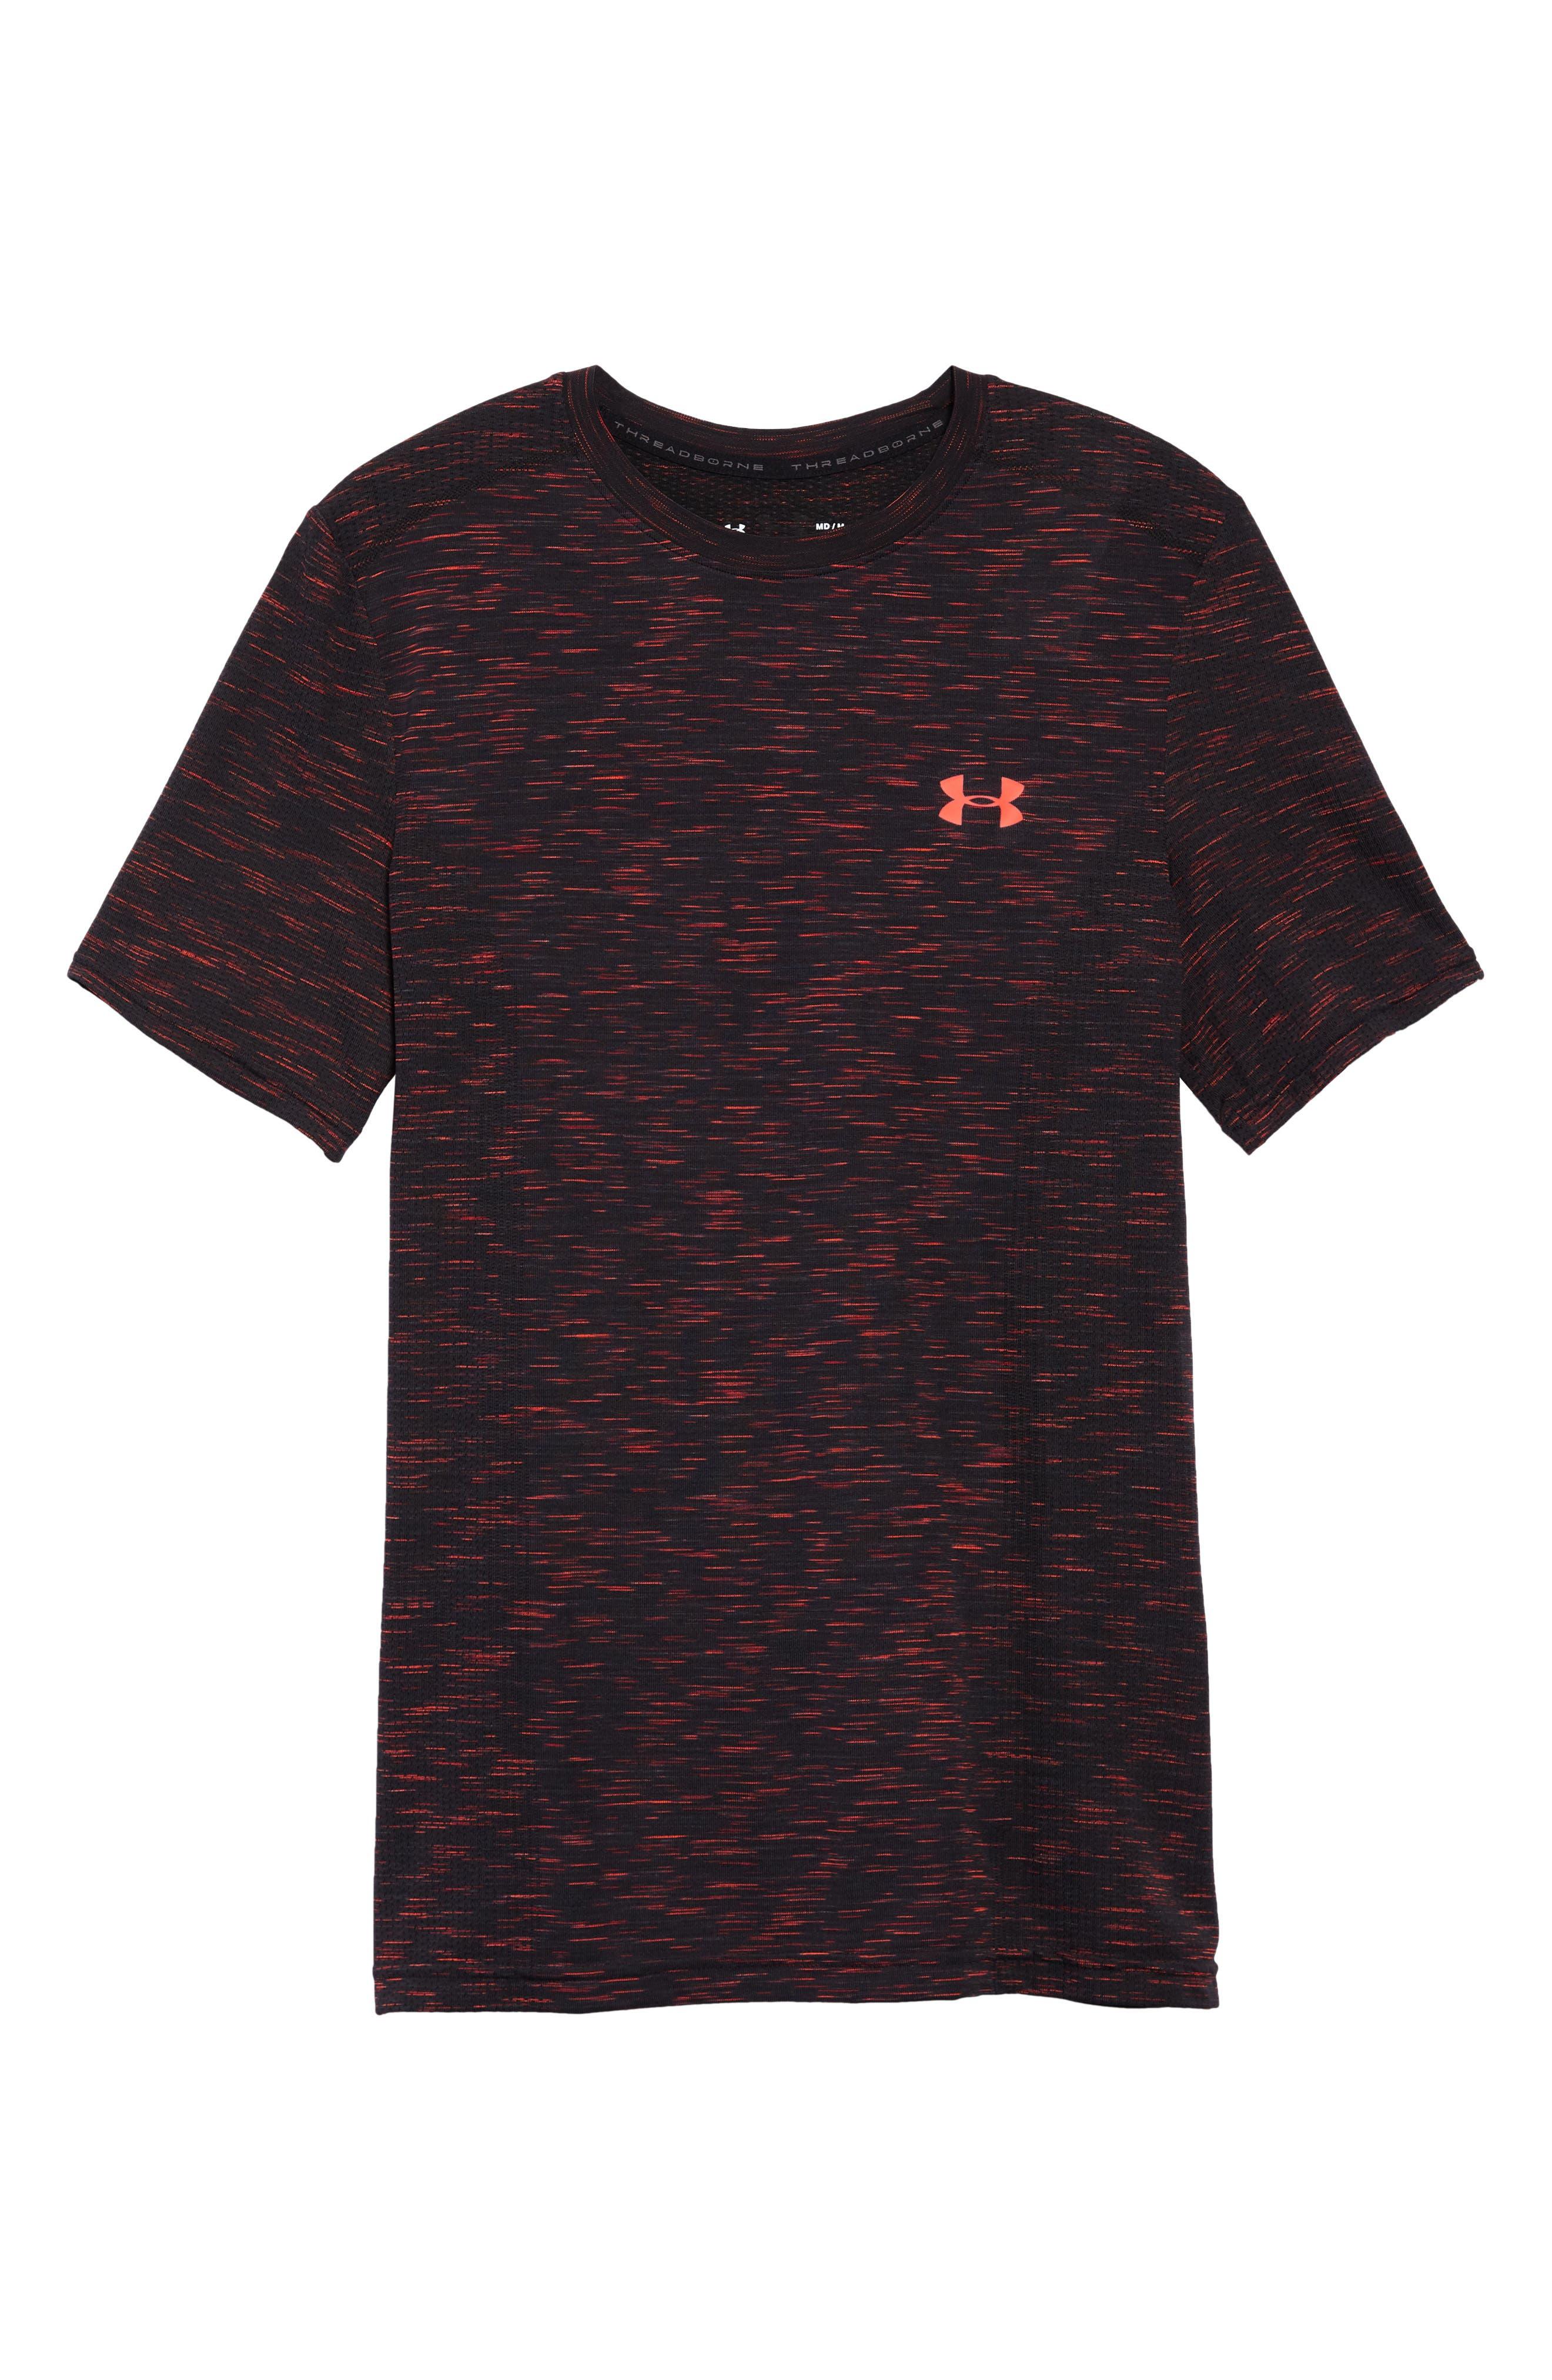 Threadborne Regular Fit T-Shirt,                             Alternate thumbnail 6, color,                             ANTHRACITE/ NEON CORAL